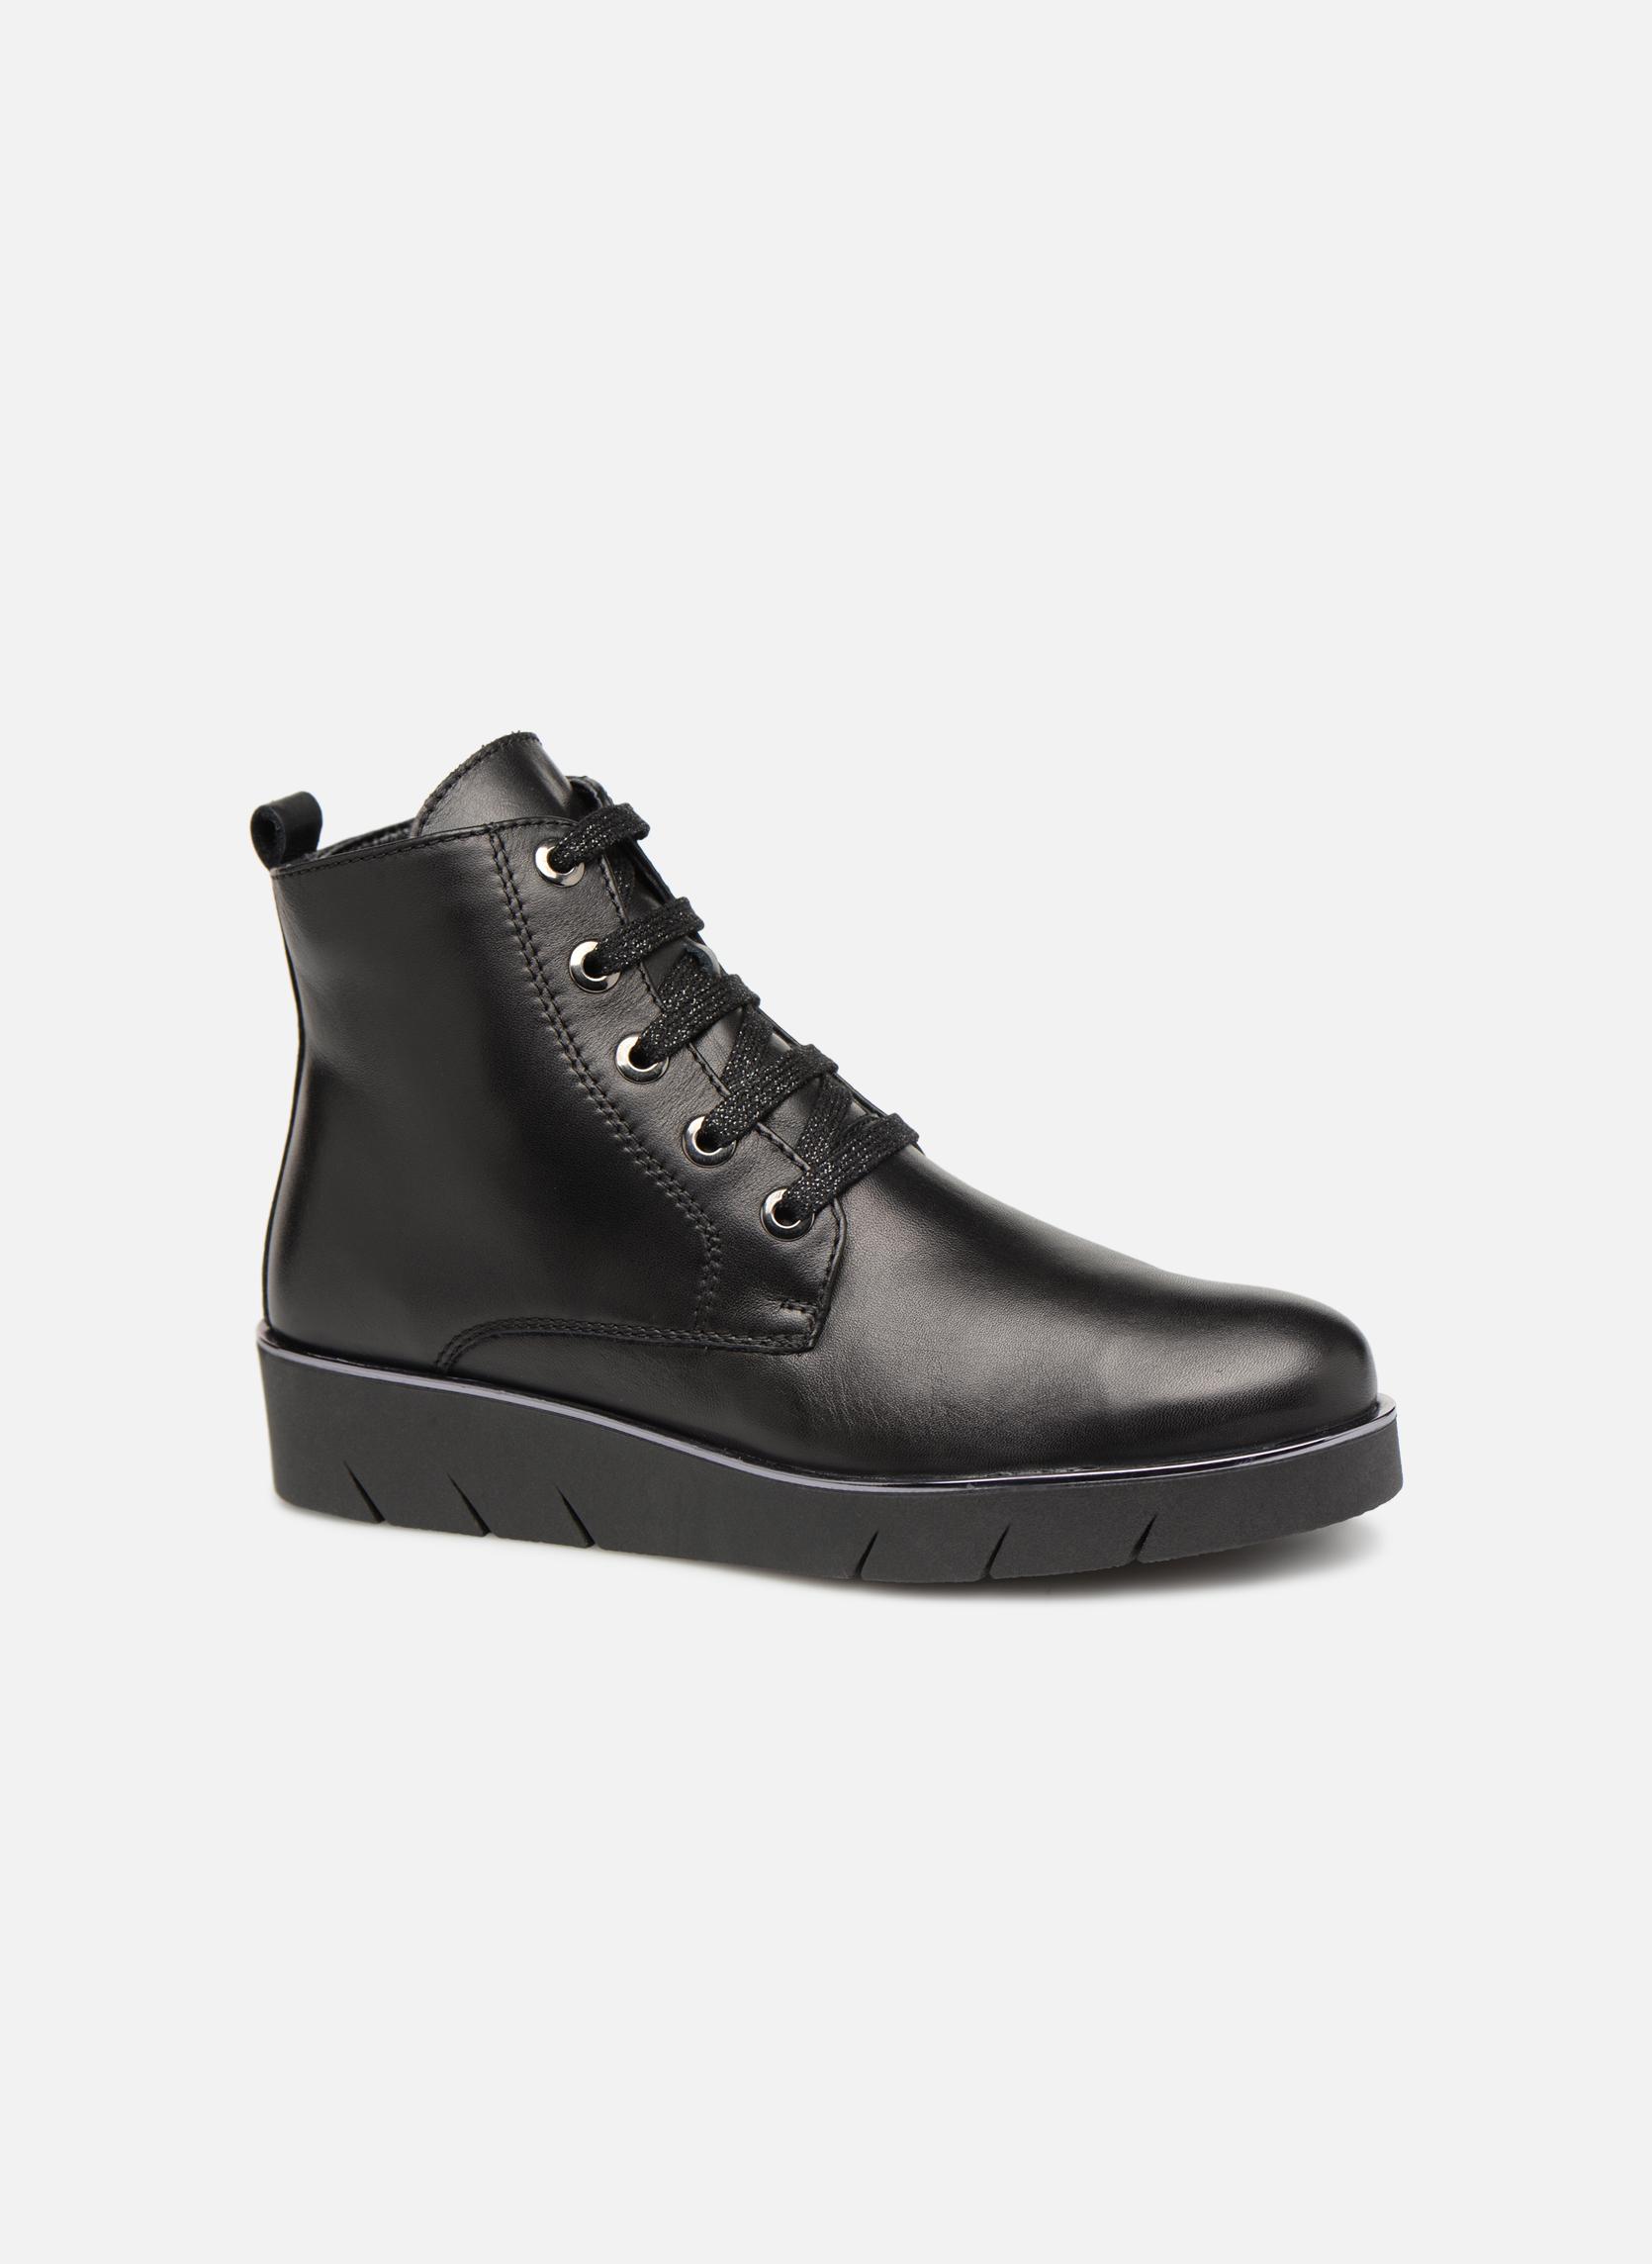 Bottines et boots Femme Rudy